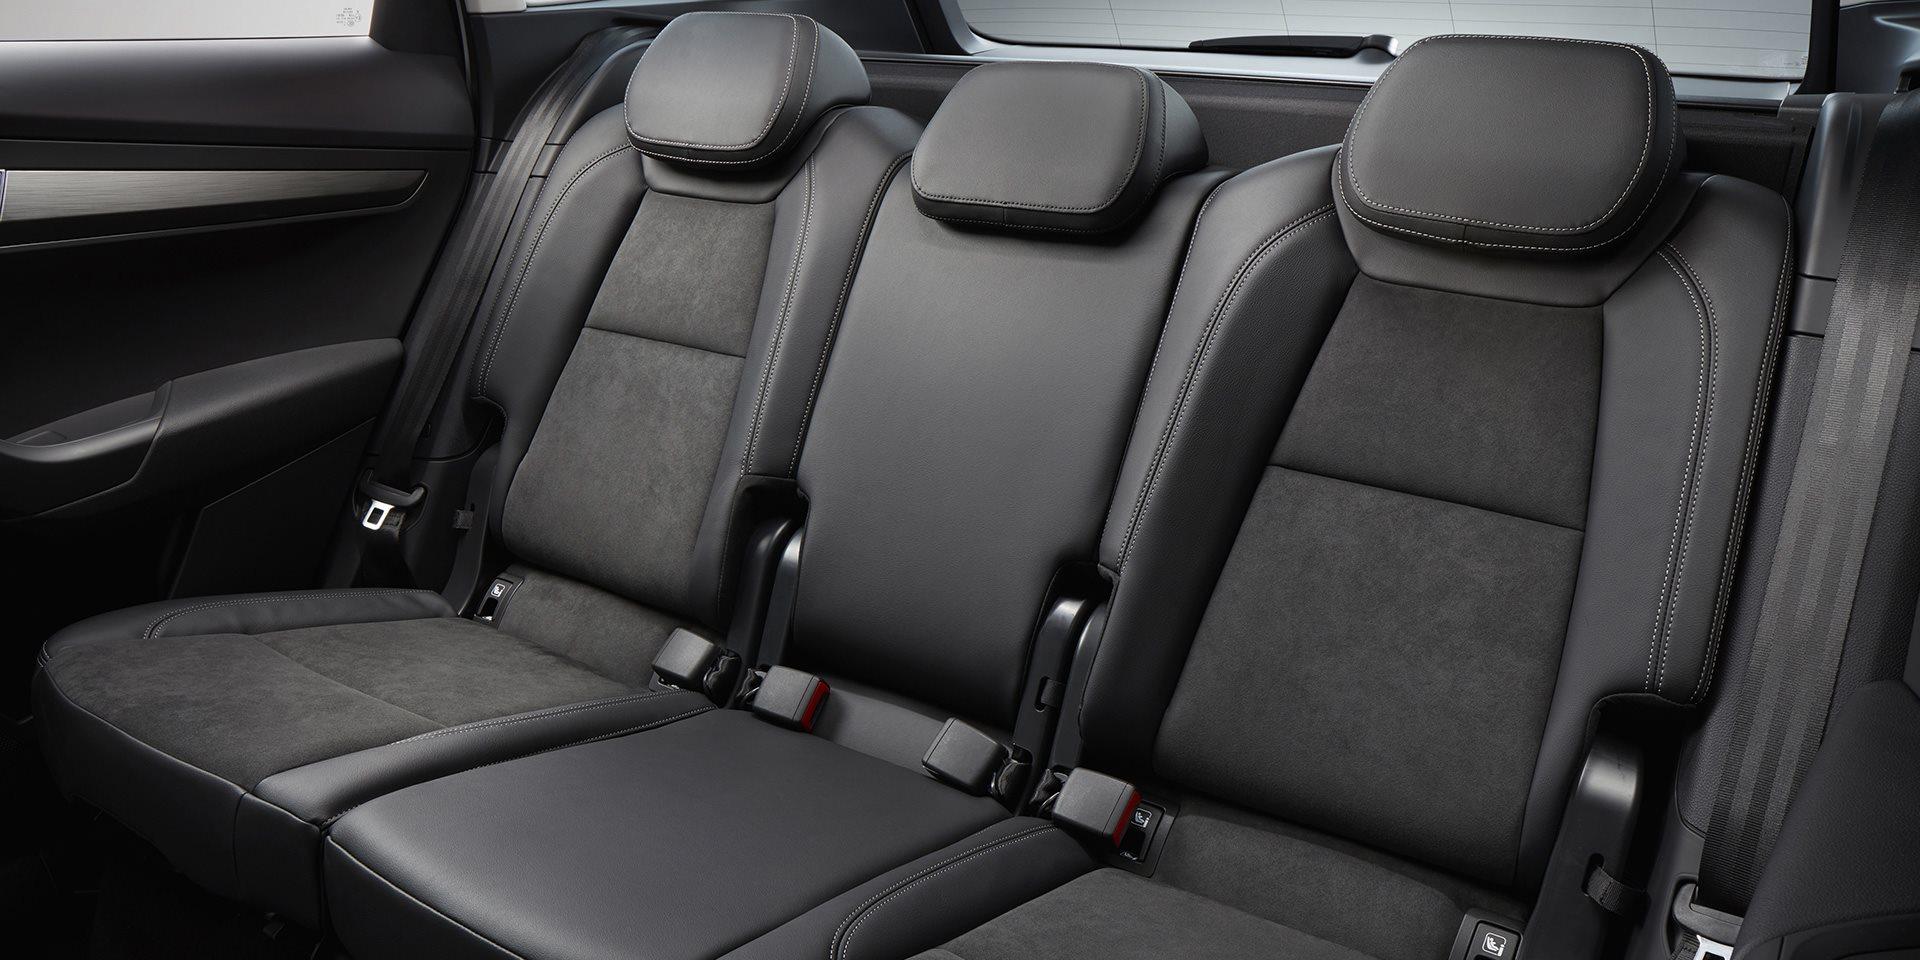 skoda-karoq-m68-interior-03.3dac9197e078243173361cc58bedbc21.fill-1920x960